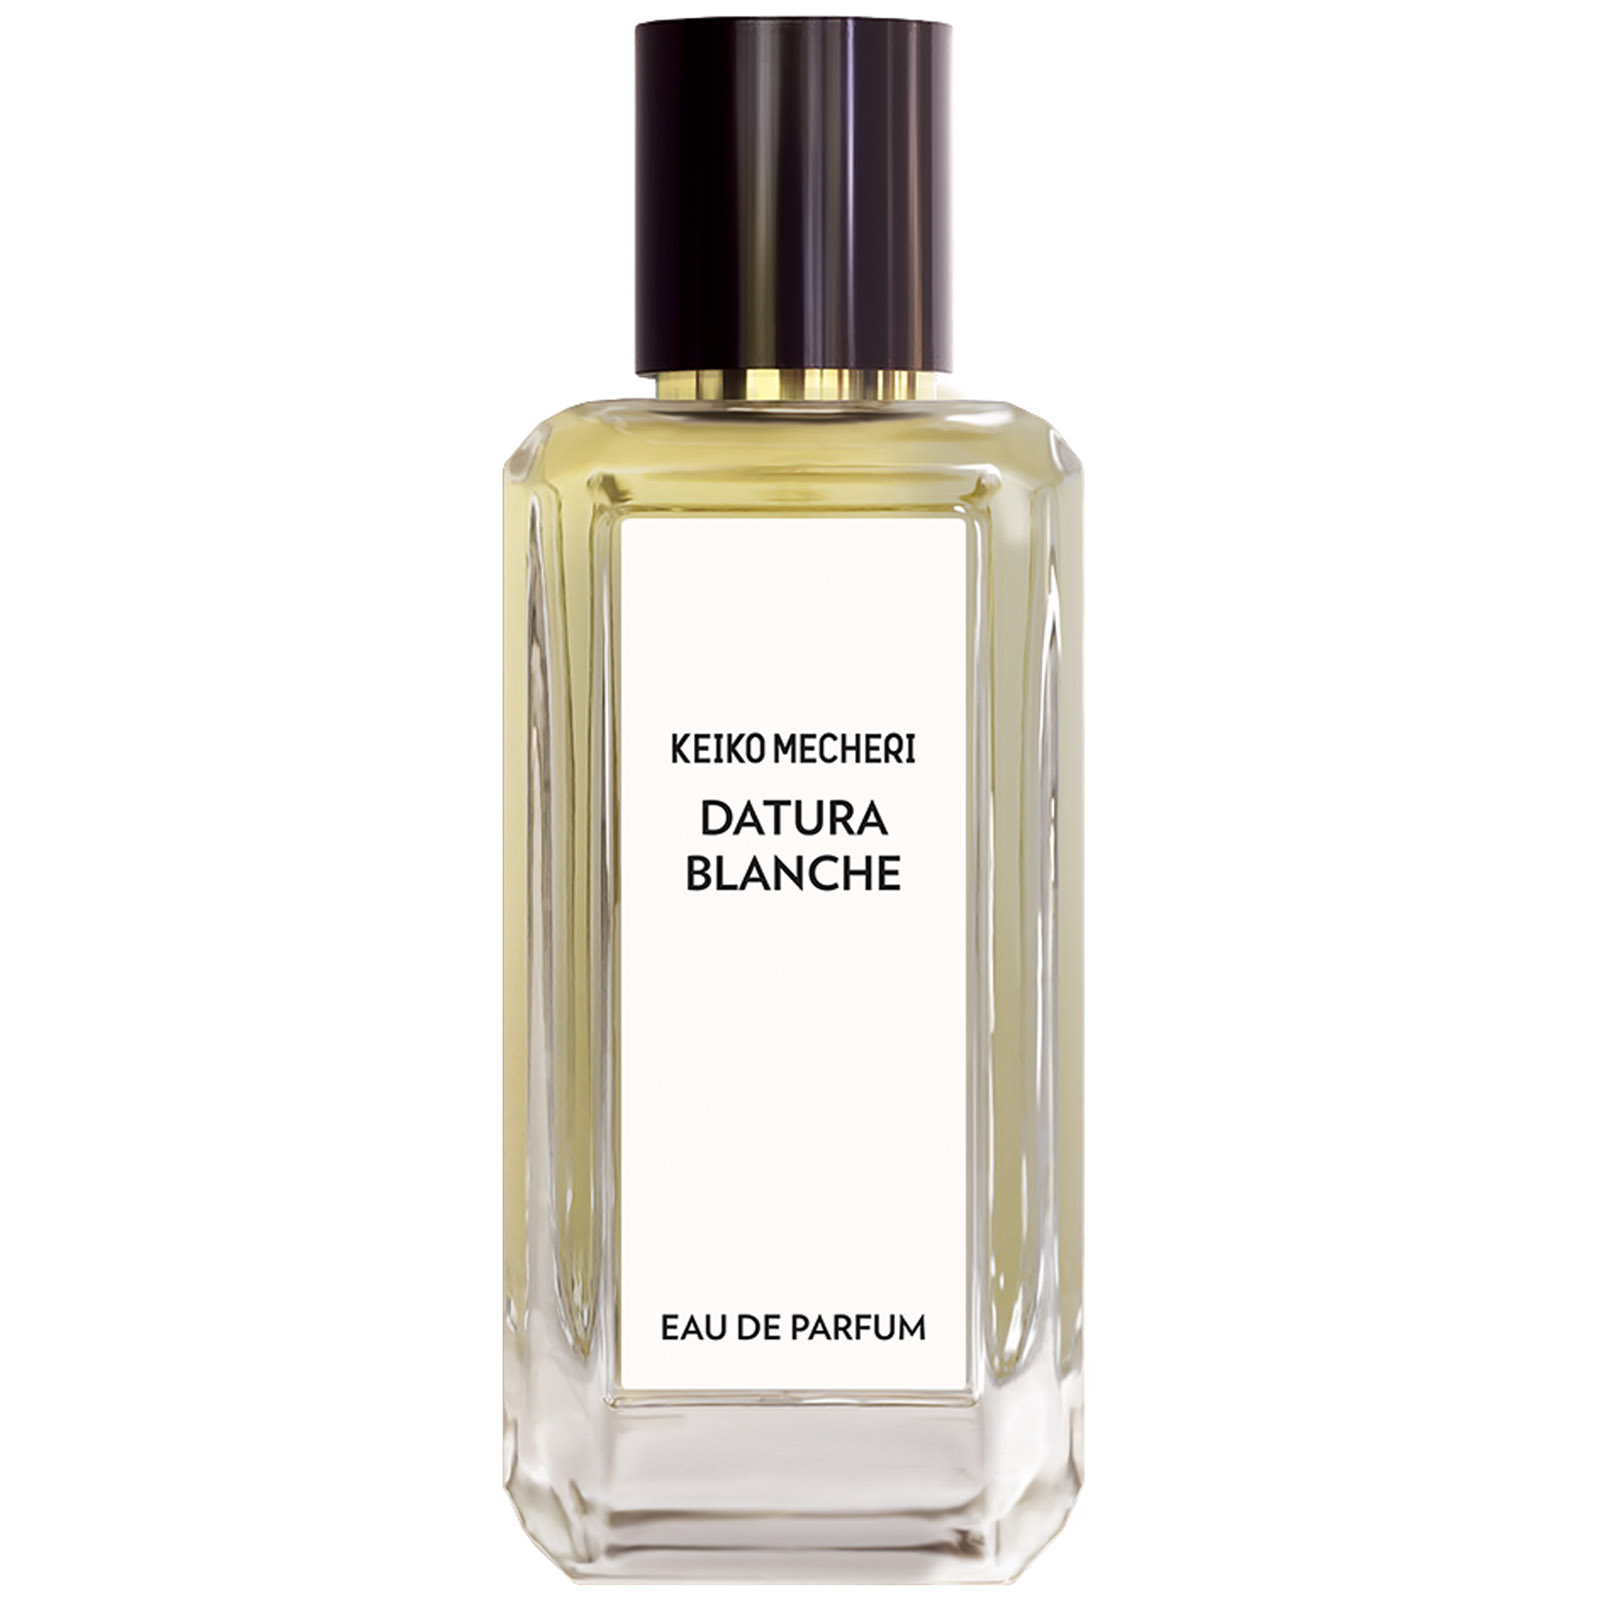 Datura blanche profumo eau de parfum 75 ml